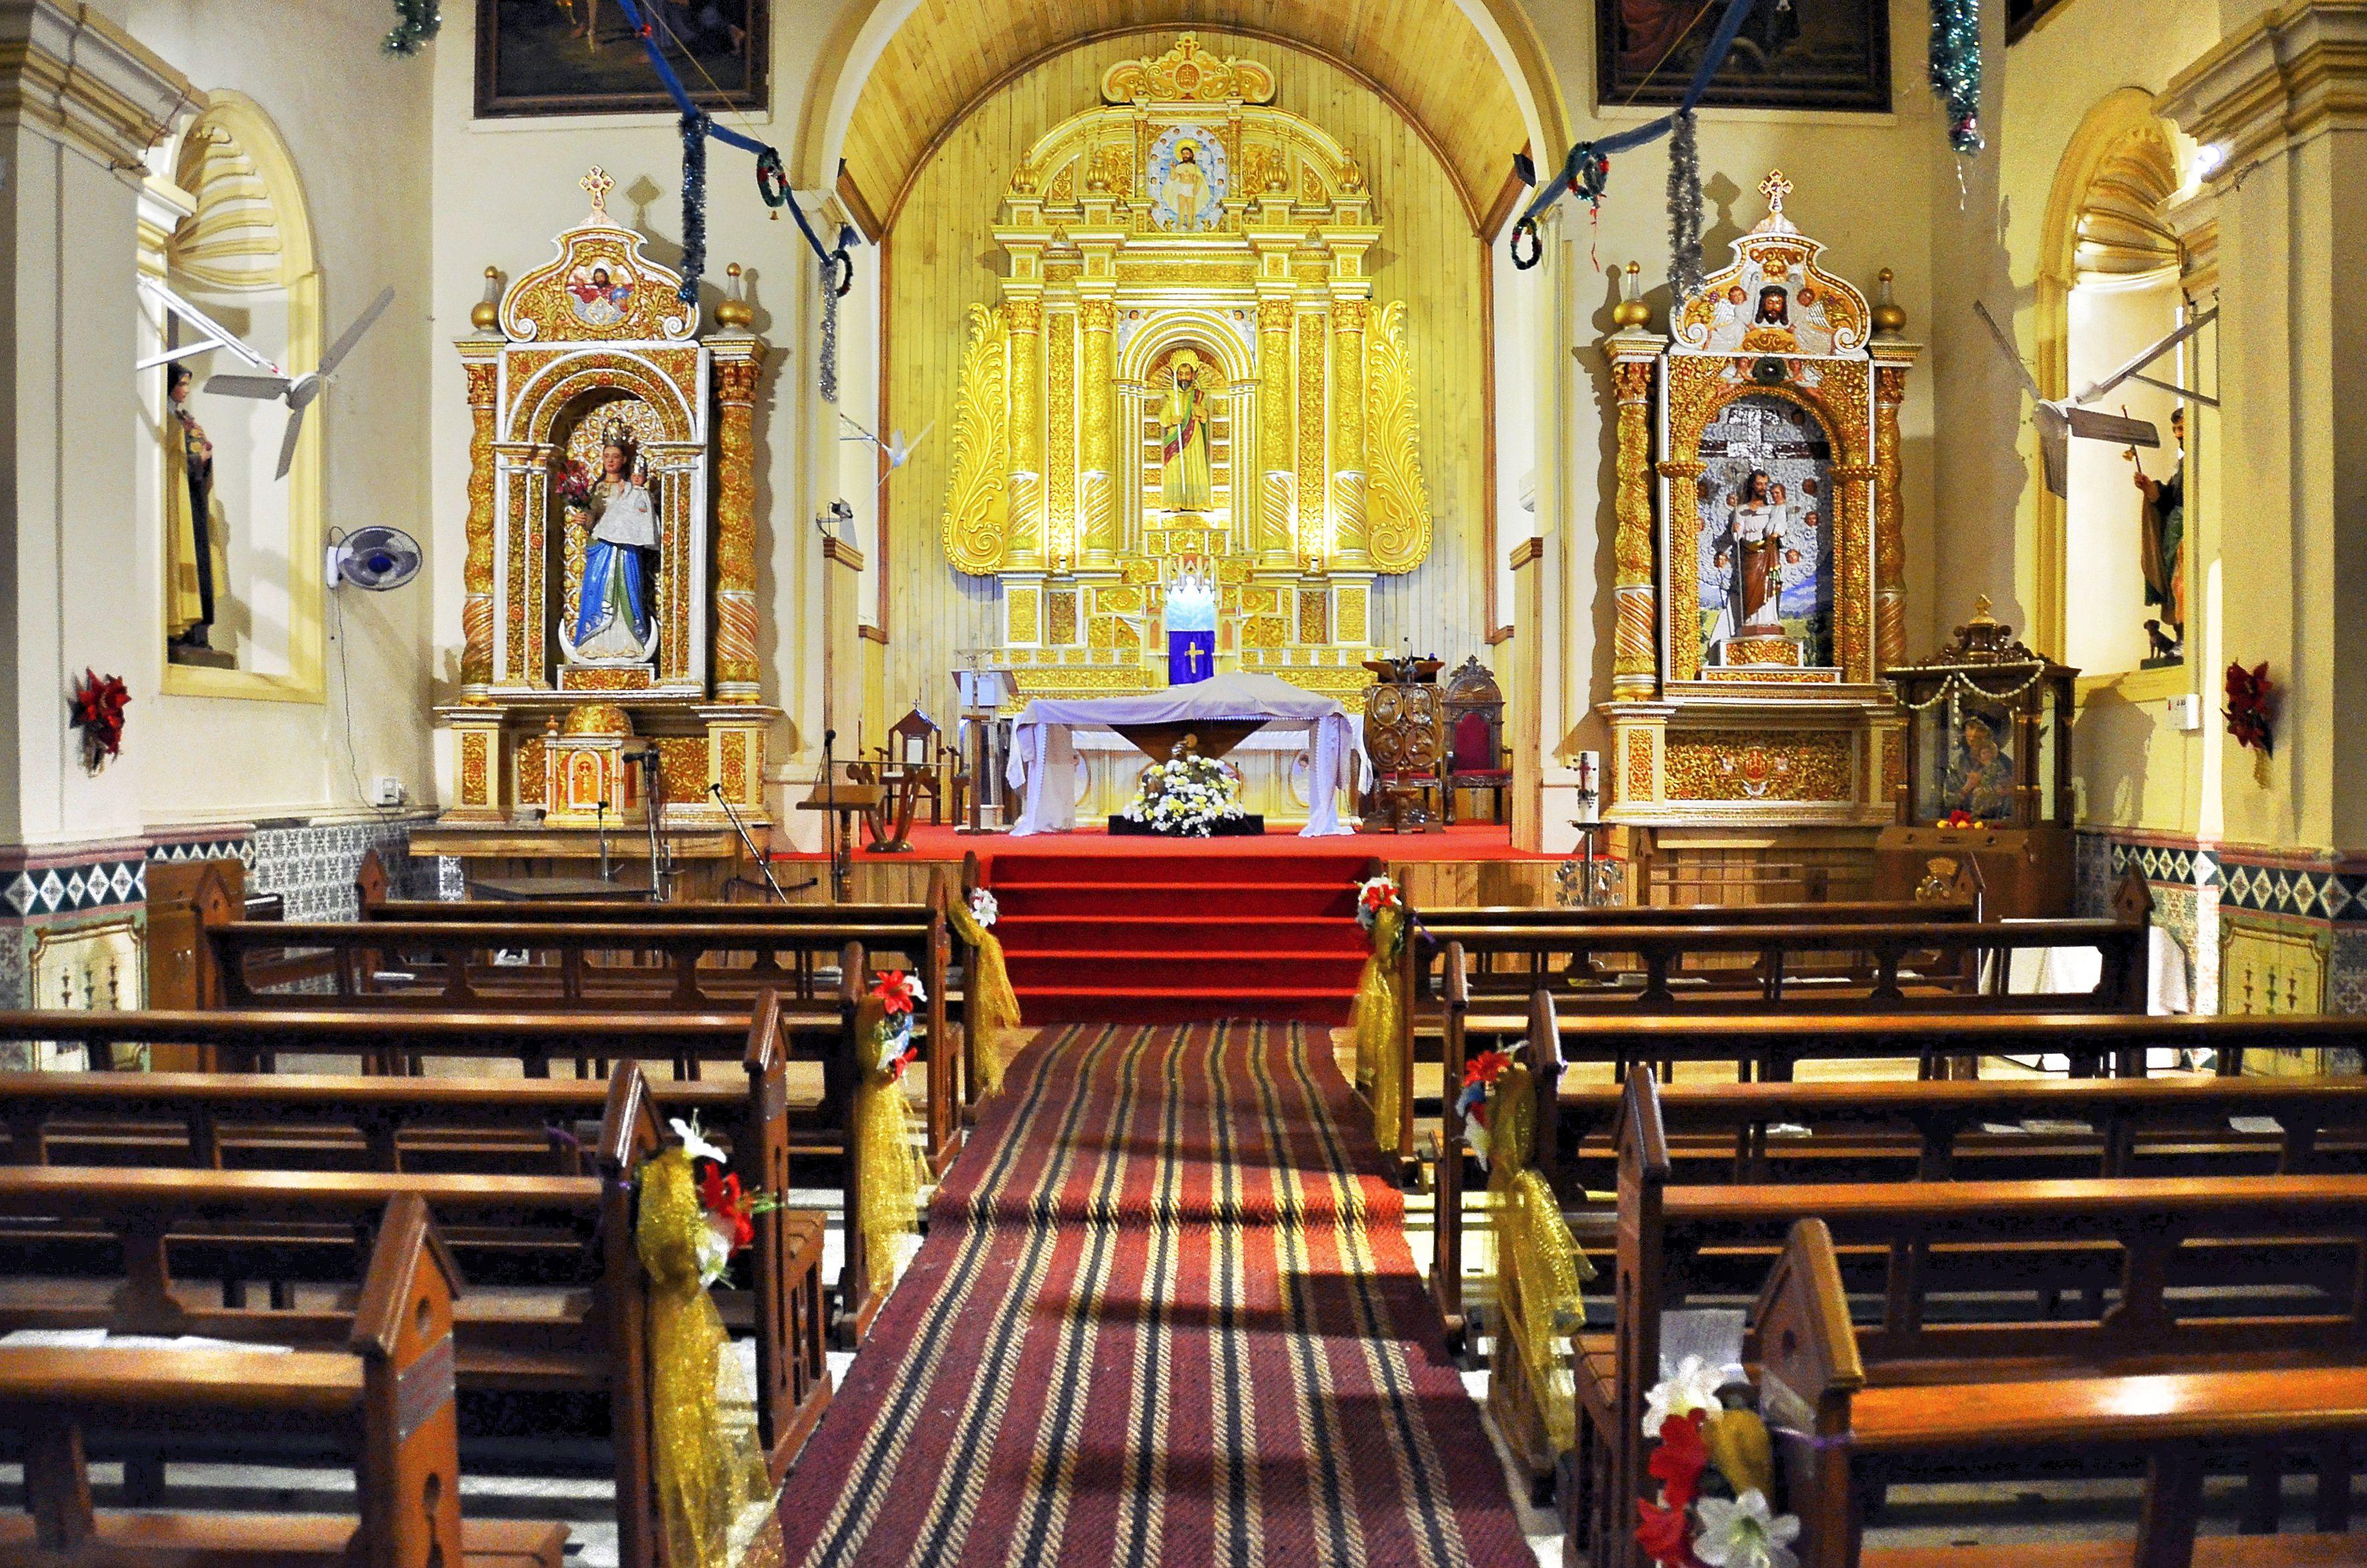 Inside Saint Thomas's church.